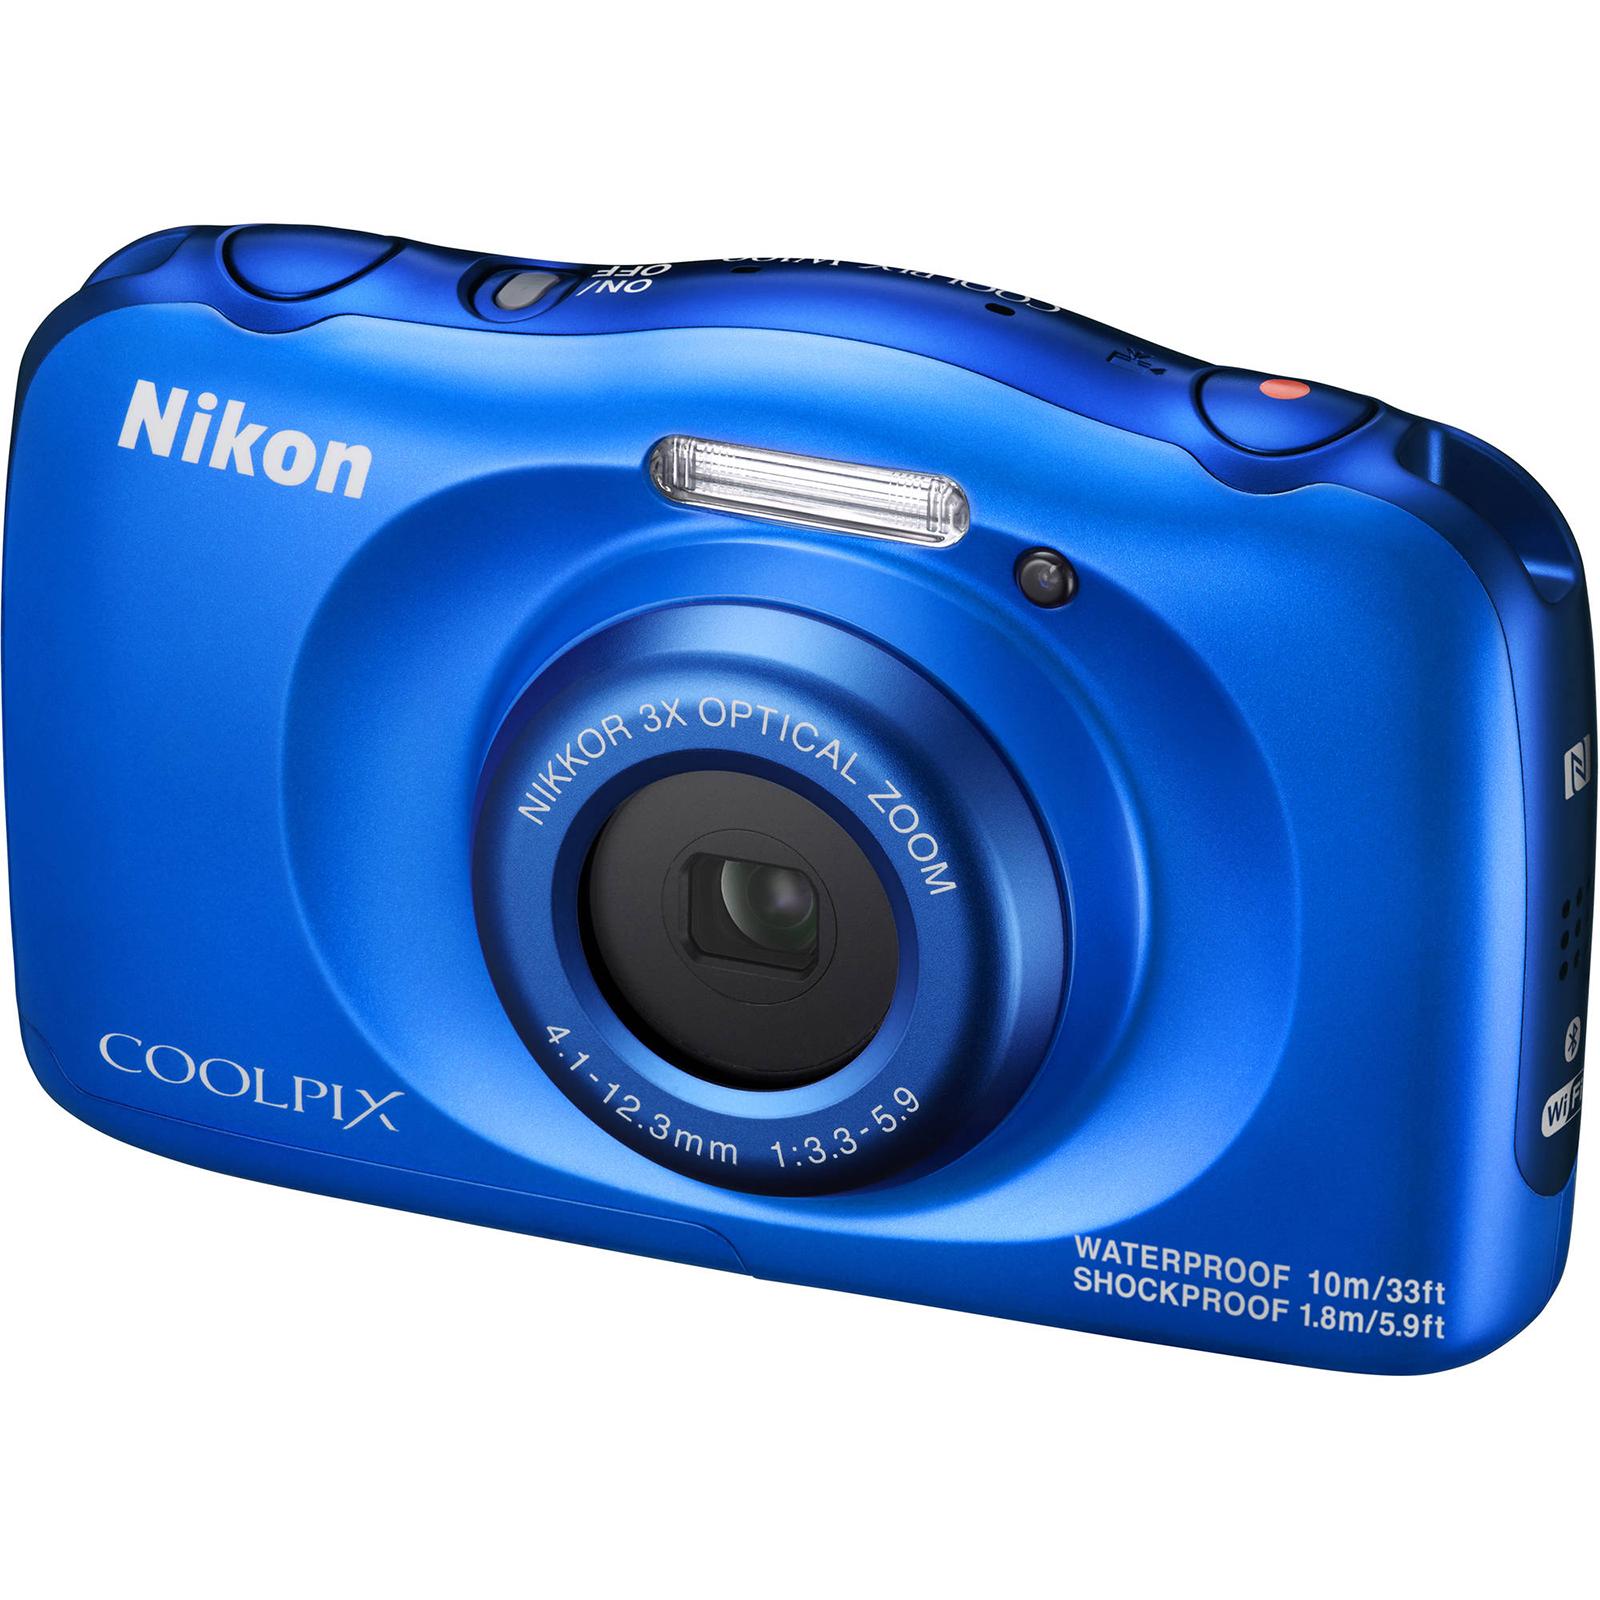 Nikon Coolpix W100 Wi-Fi Shock & Waterproof Digital Camera (Blue)